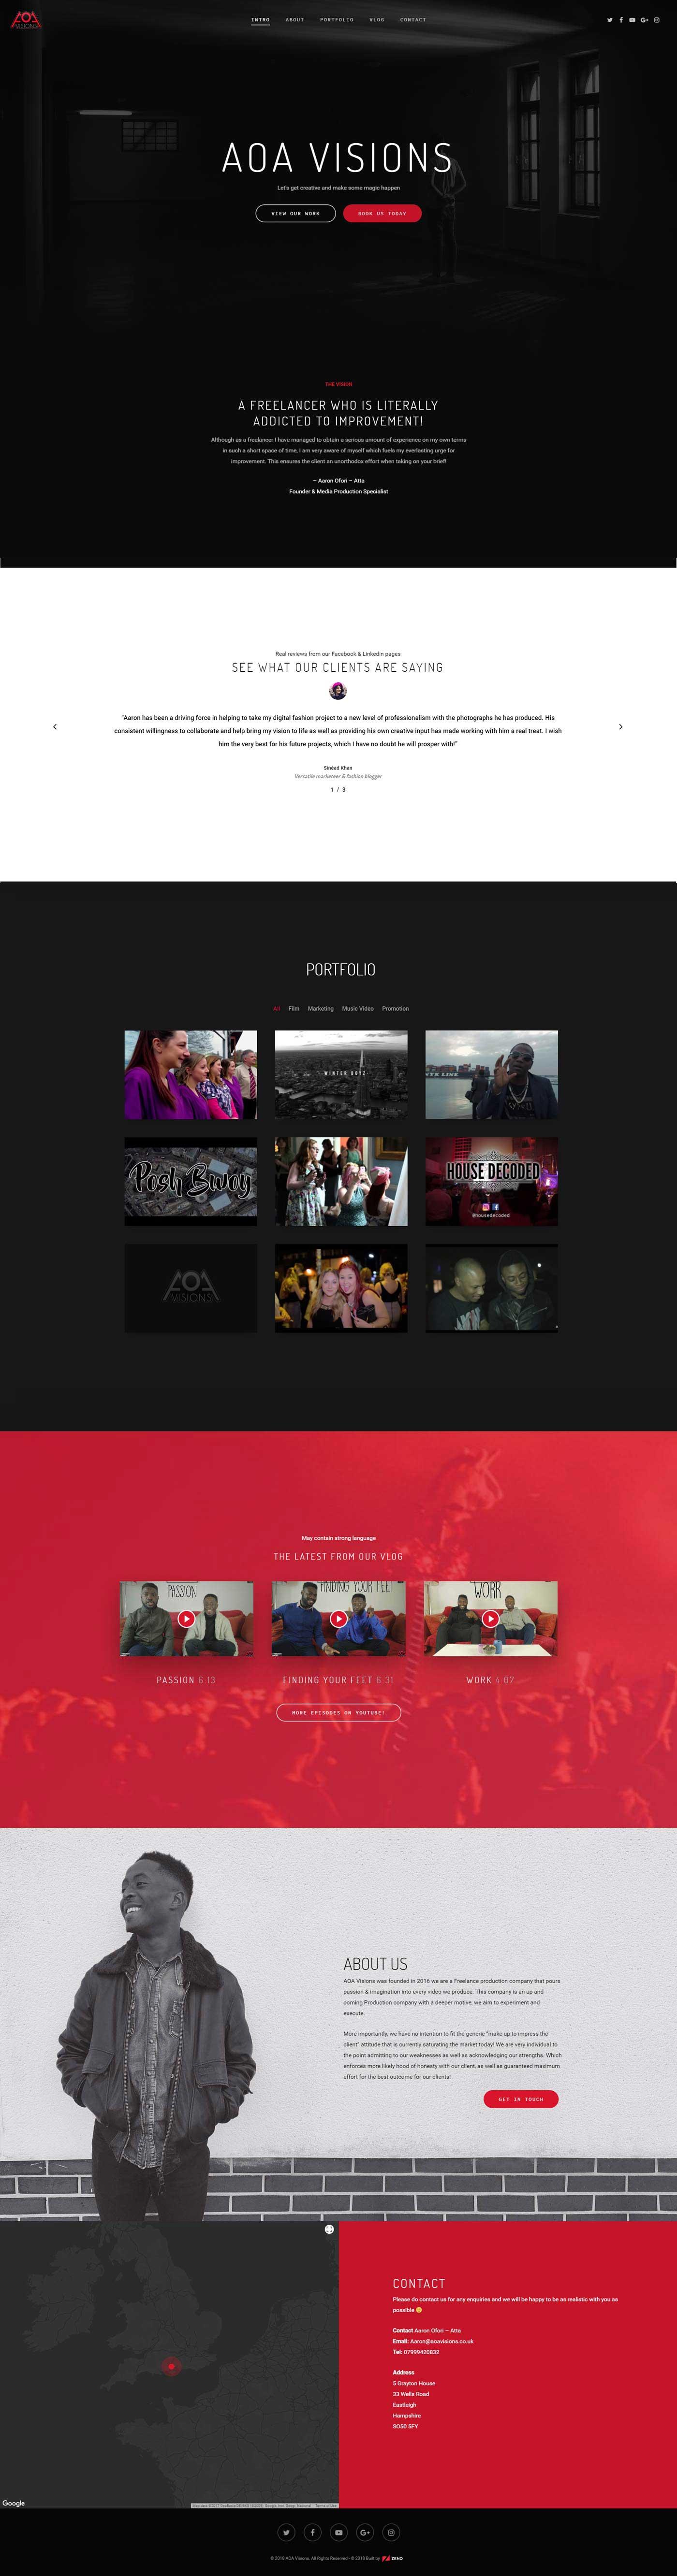 media production company website design